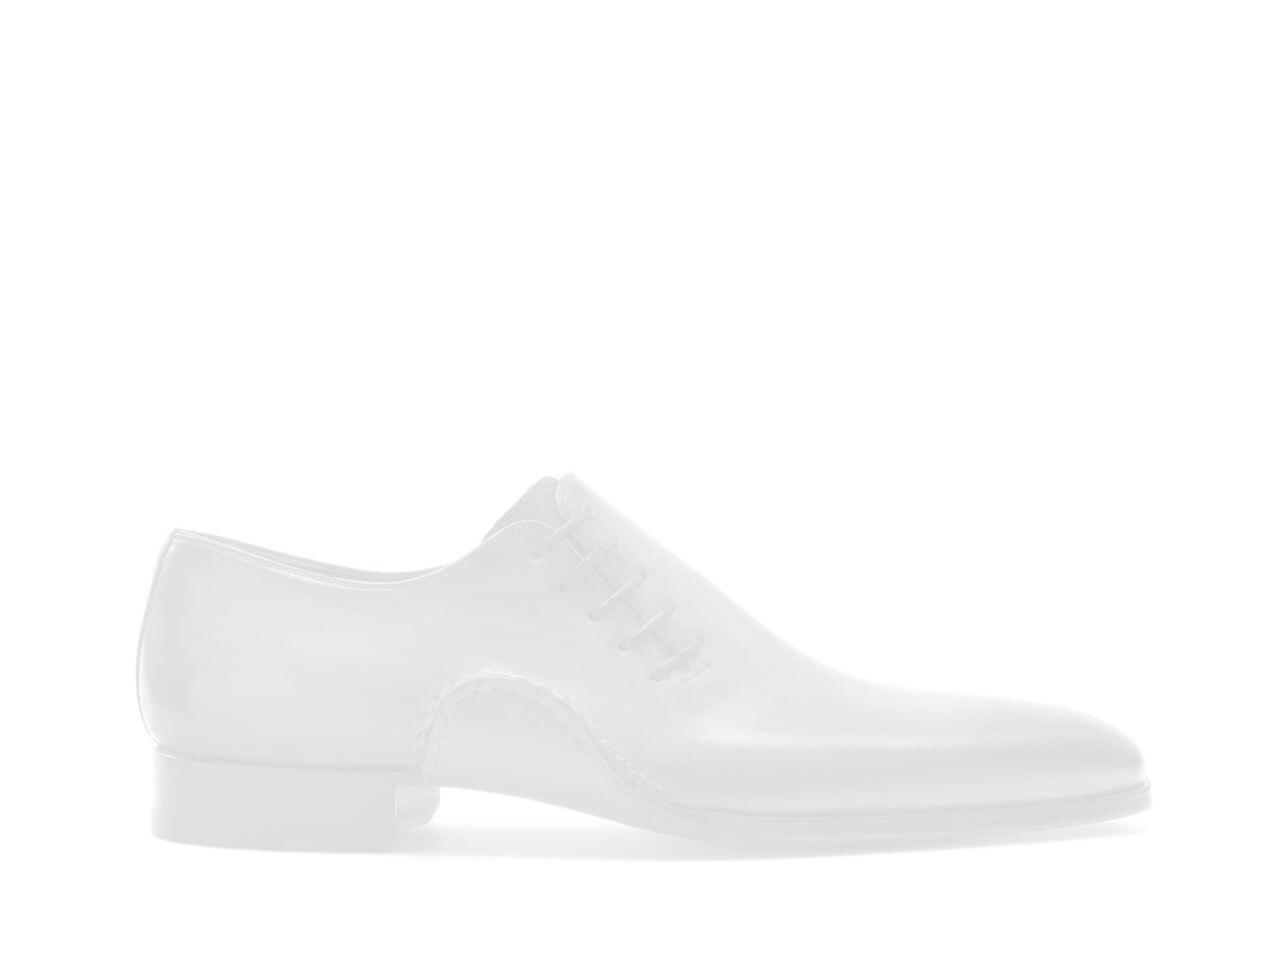 f009c39edea Cognac brown hand-painted calfskin lace up oxford shoes for men - Magnanni